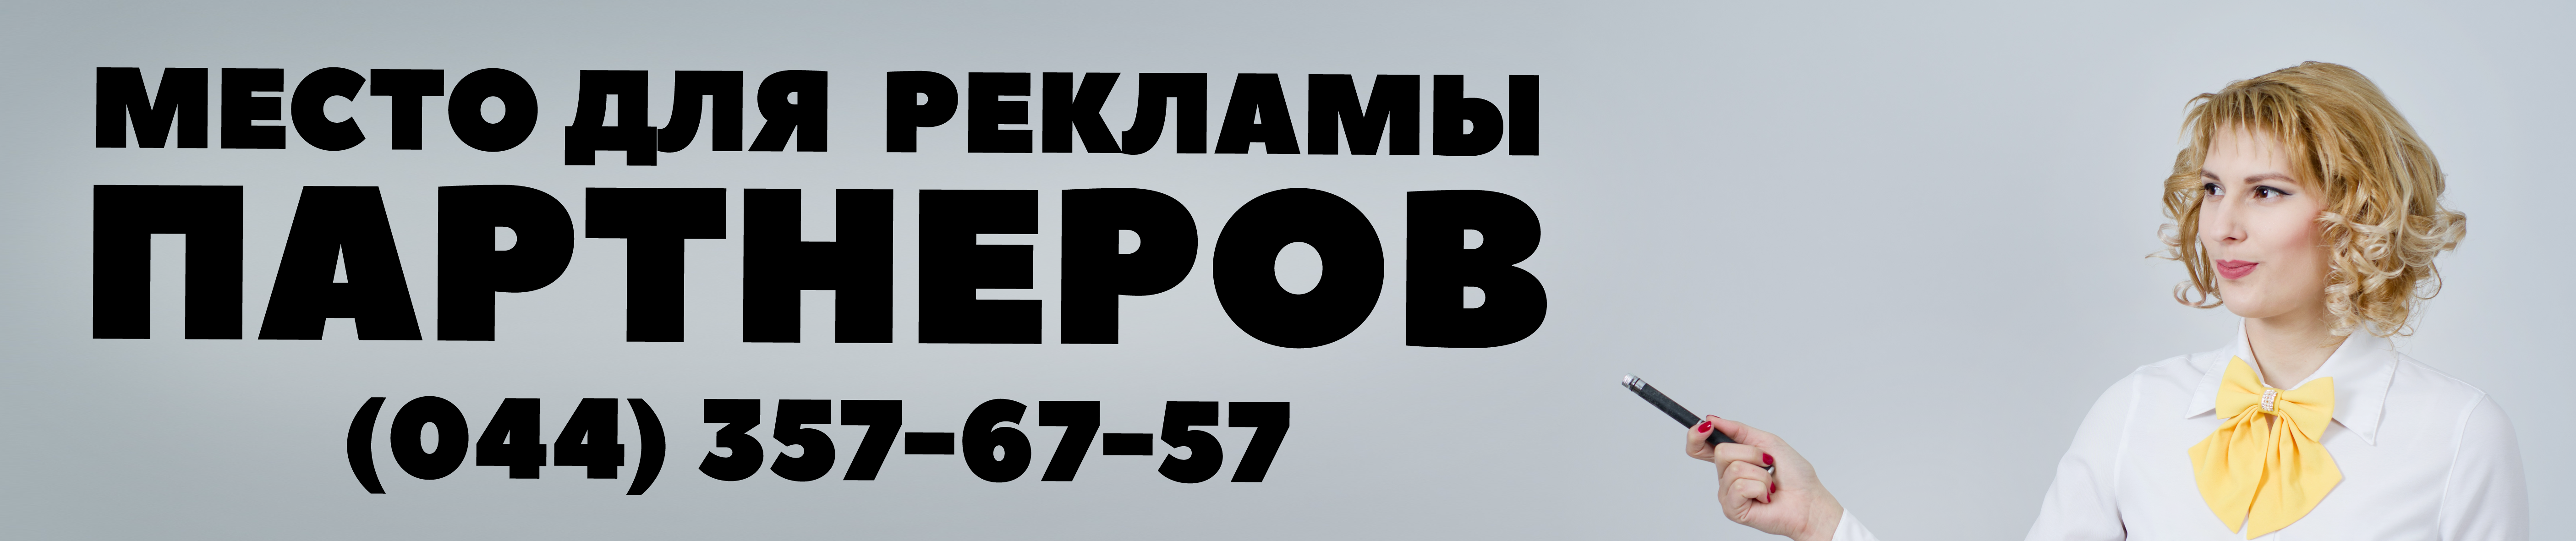 banner_2-2